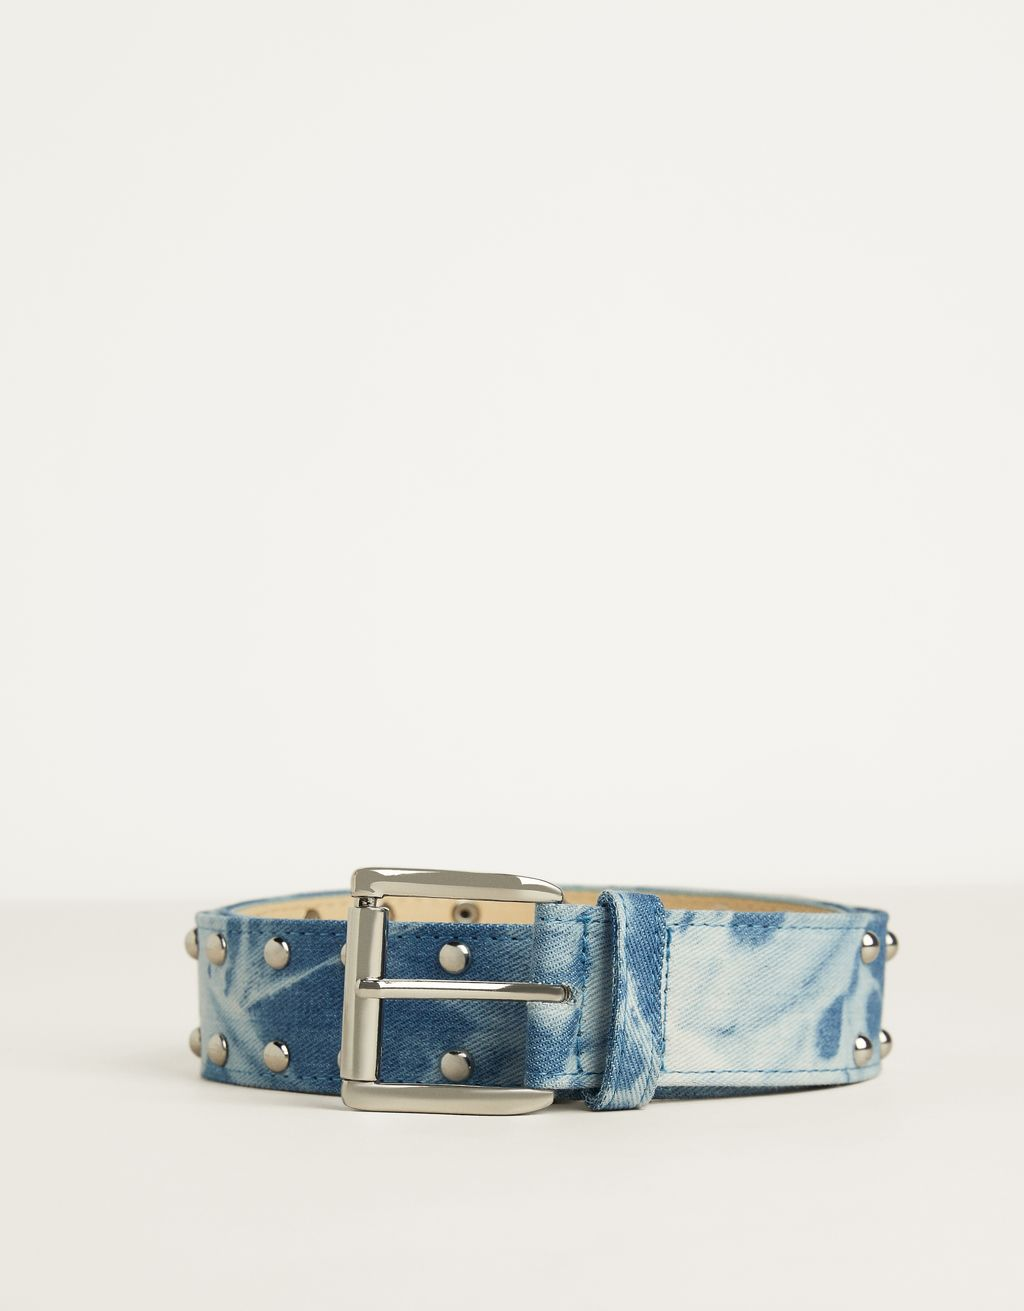 Studded denim belt